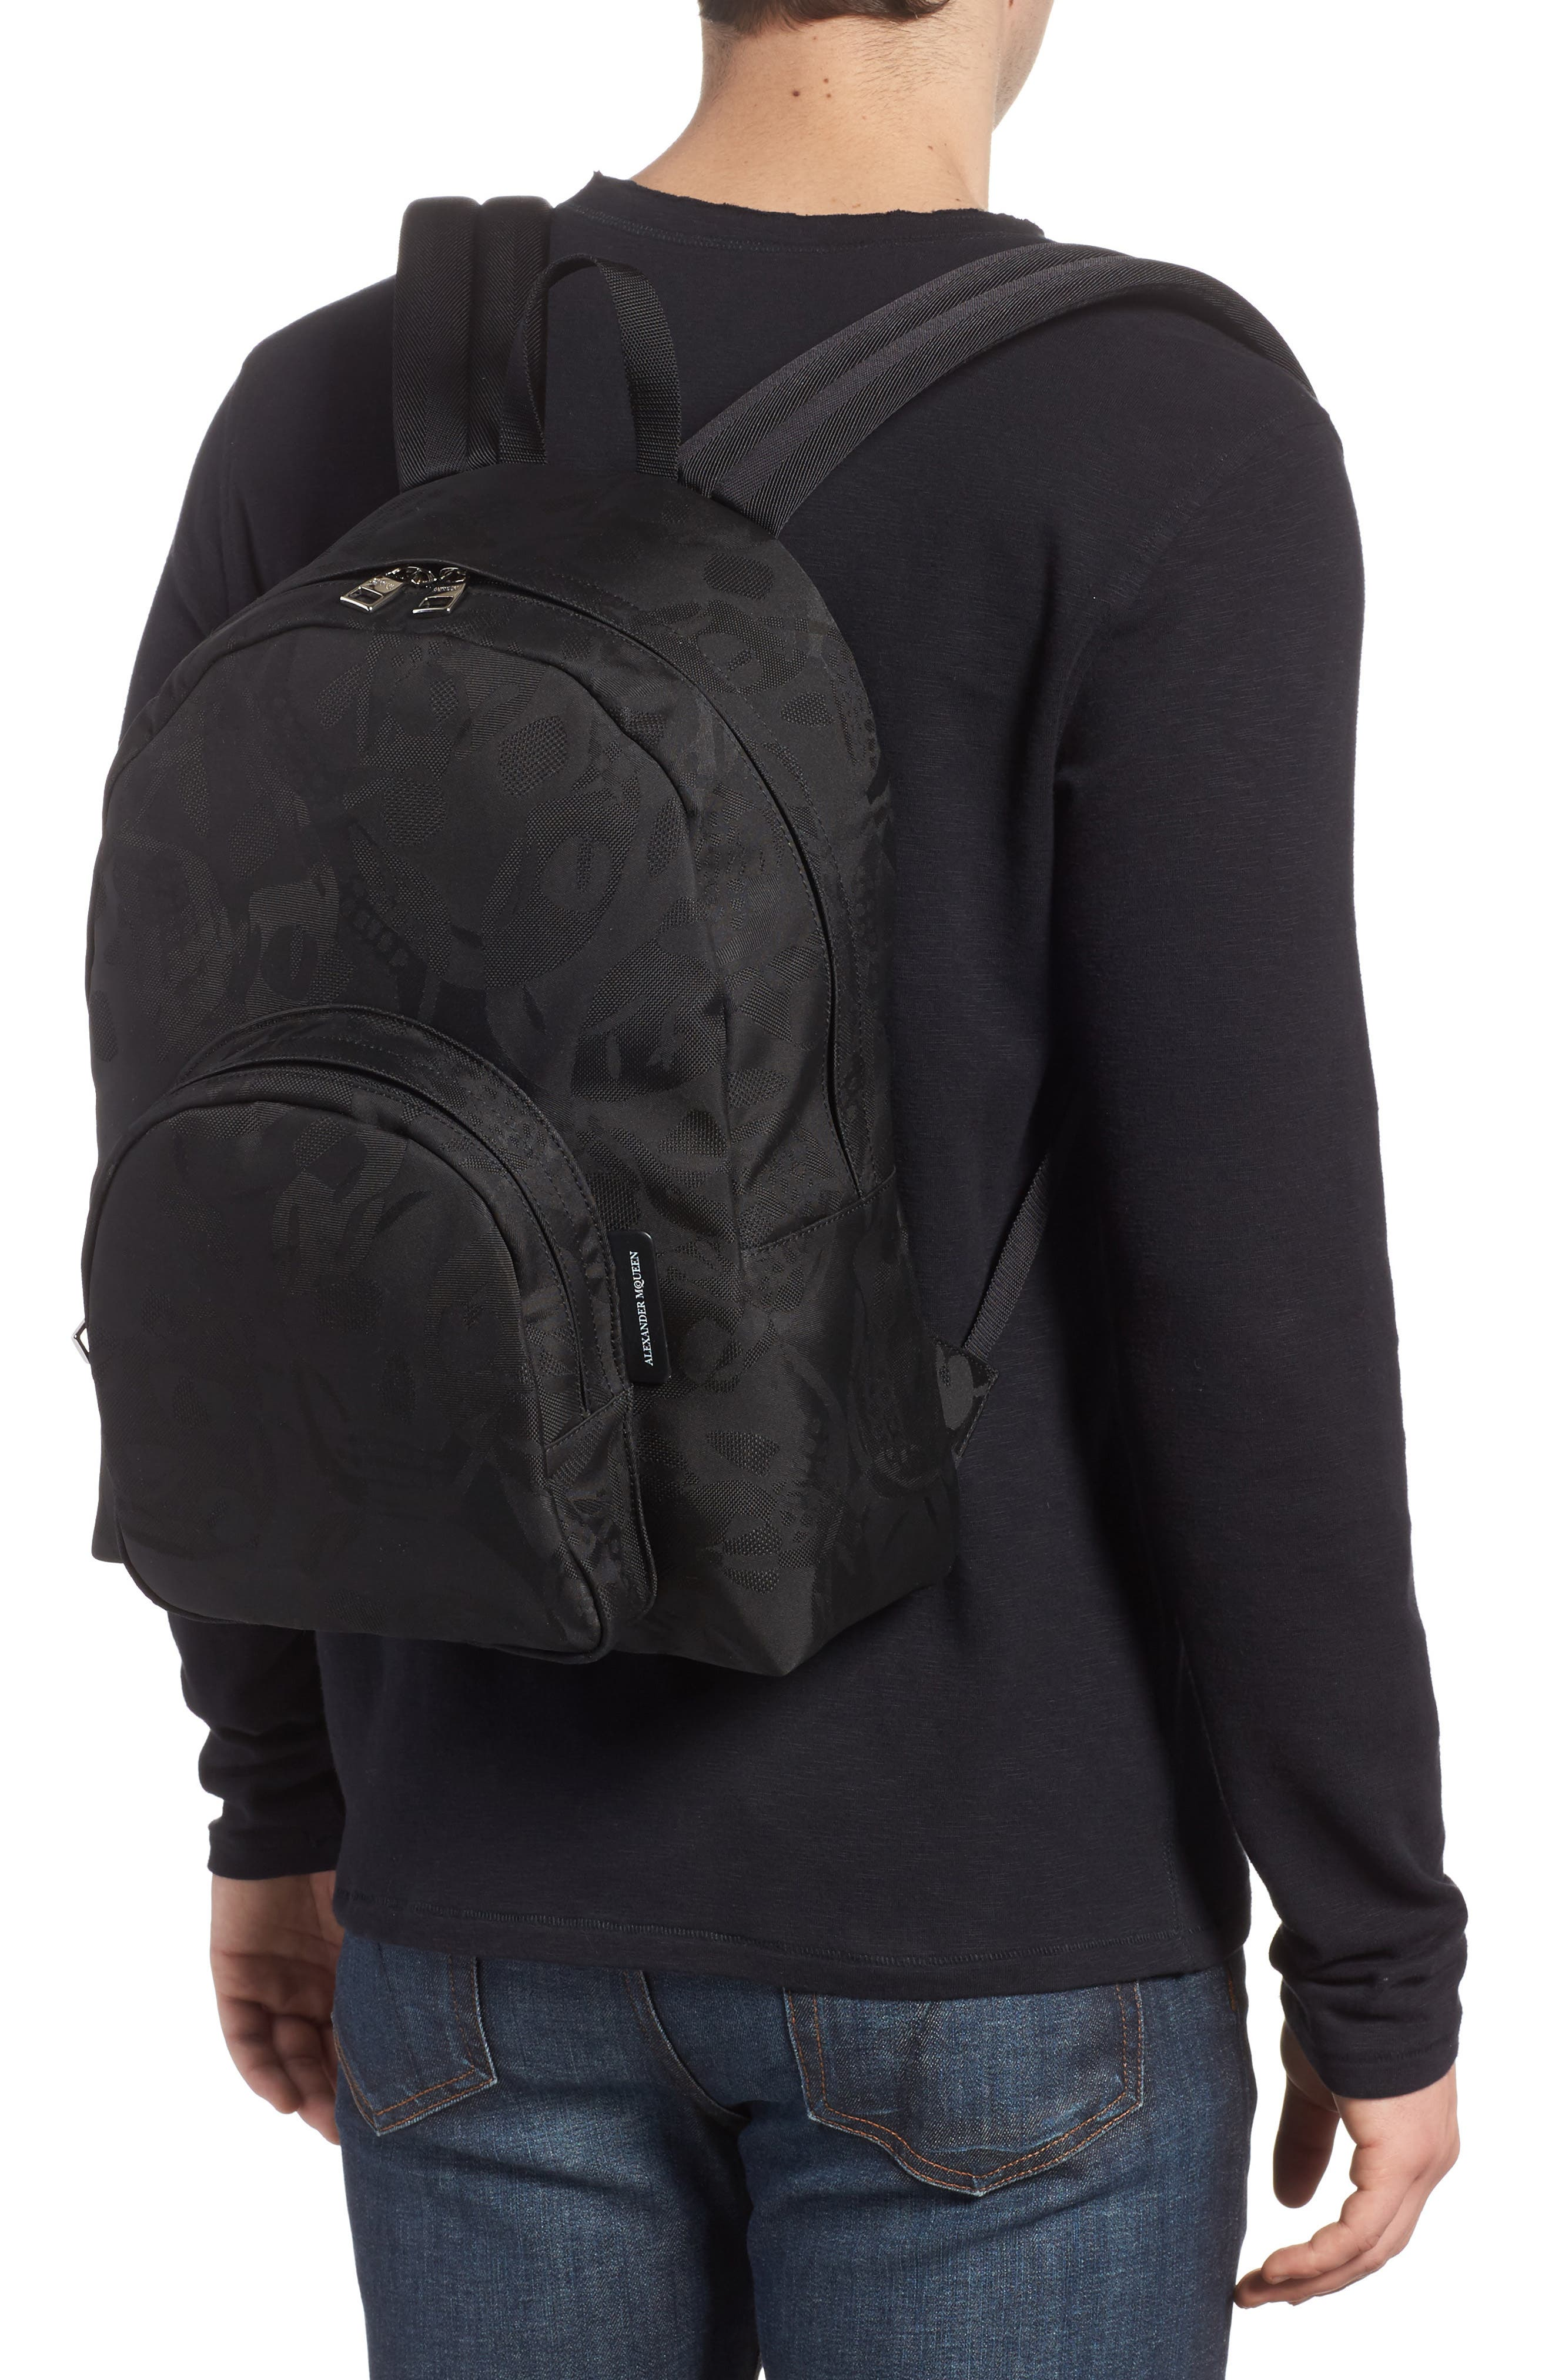 Small Backpack,                             Alternate thumbnail 2, color,                             Black